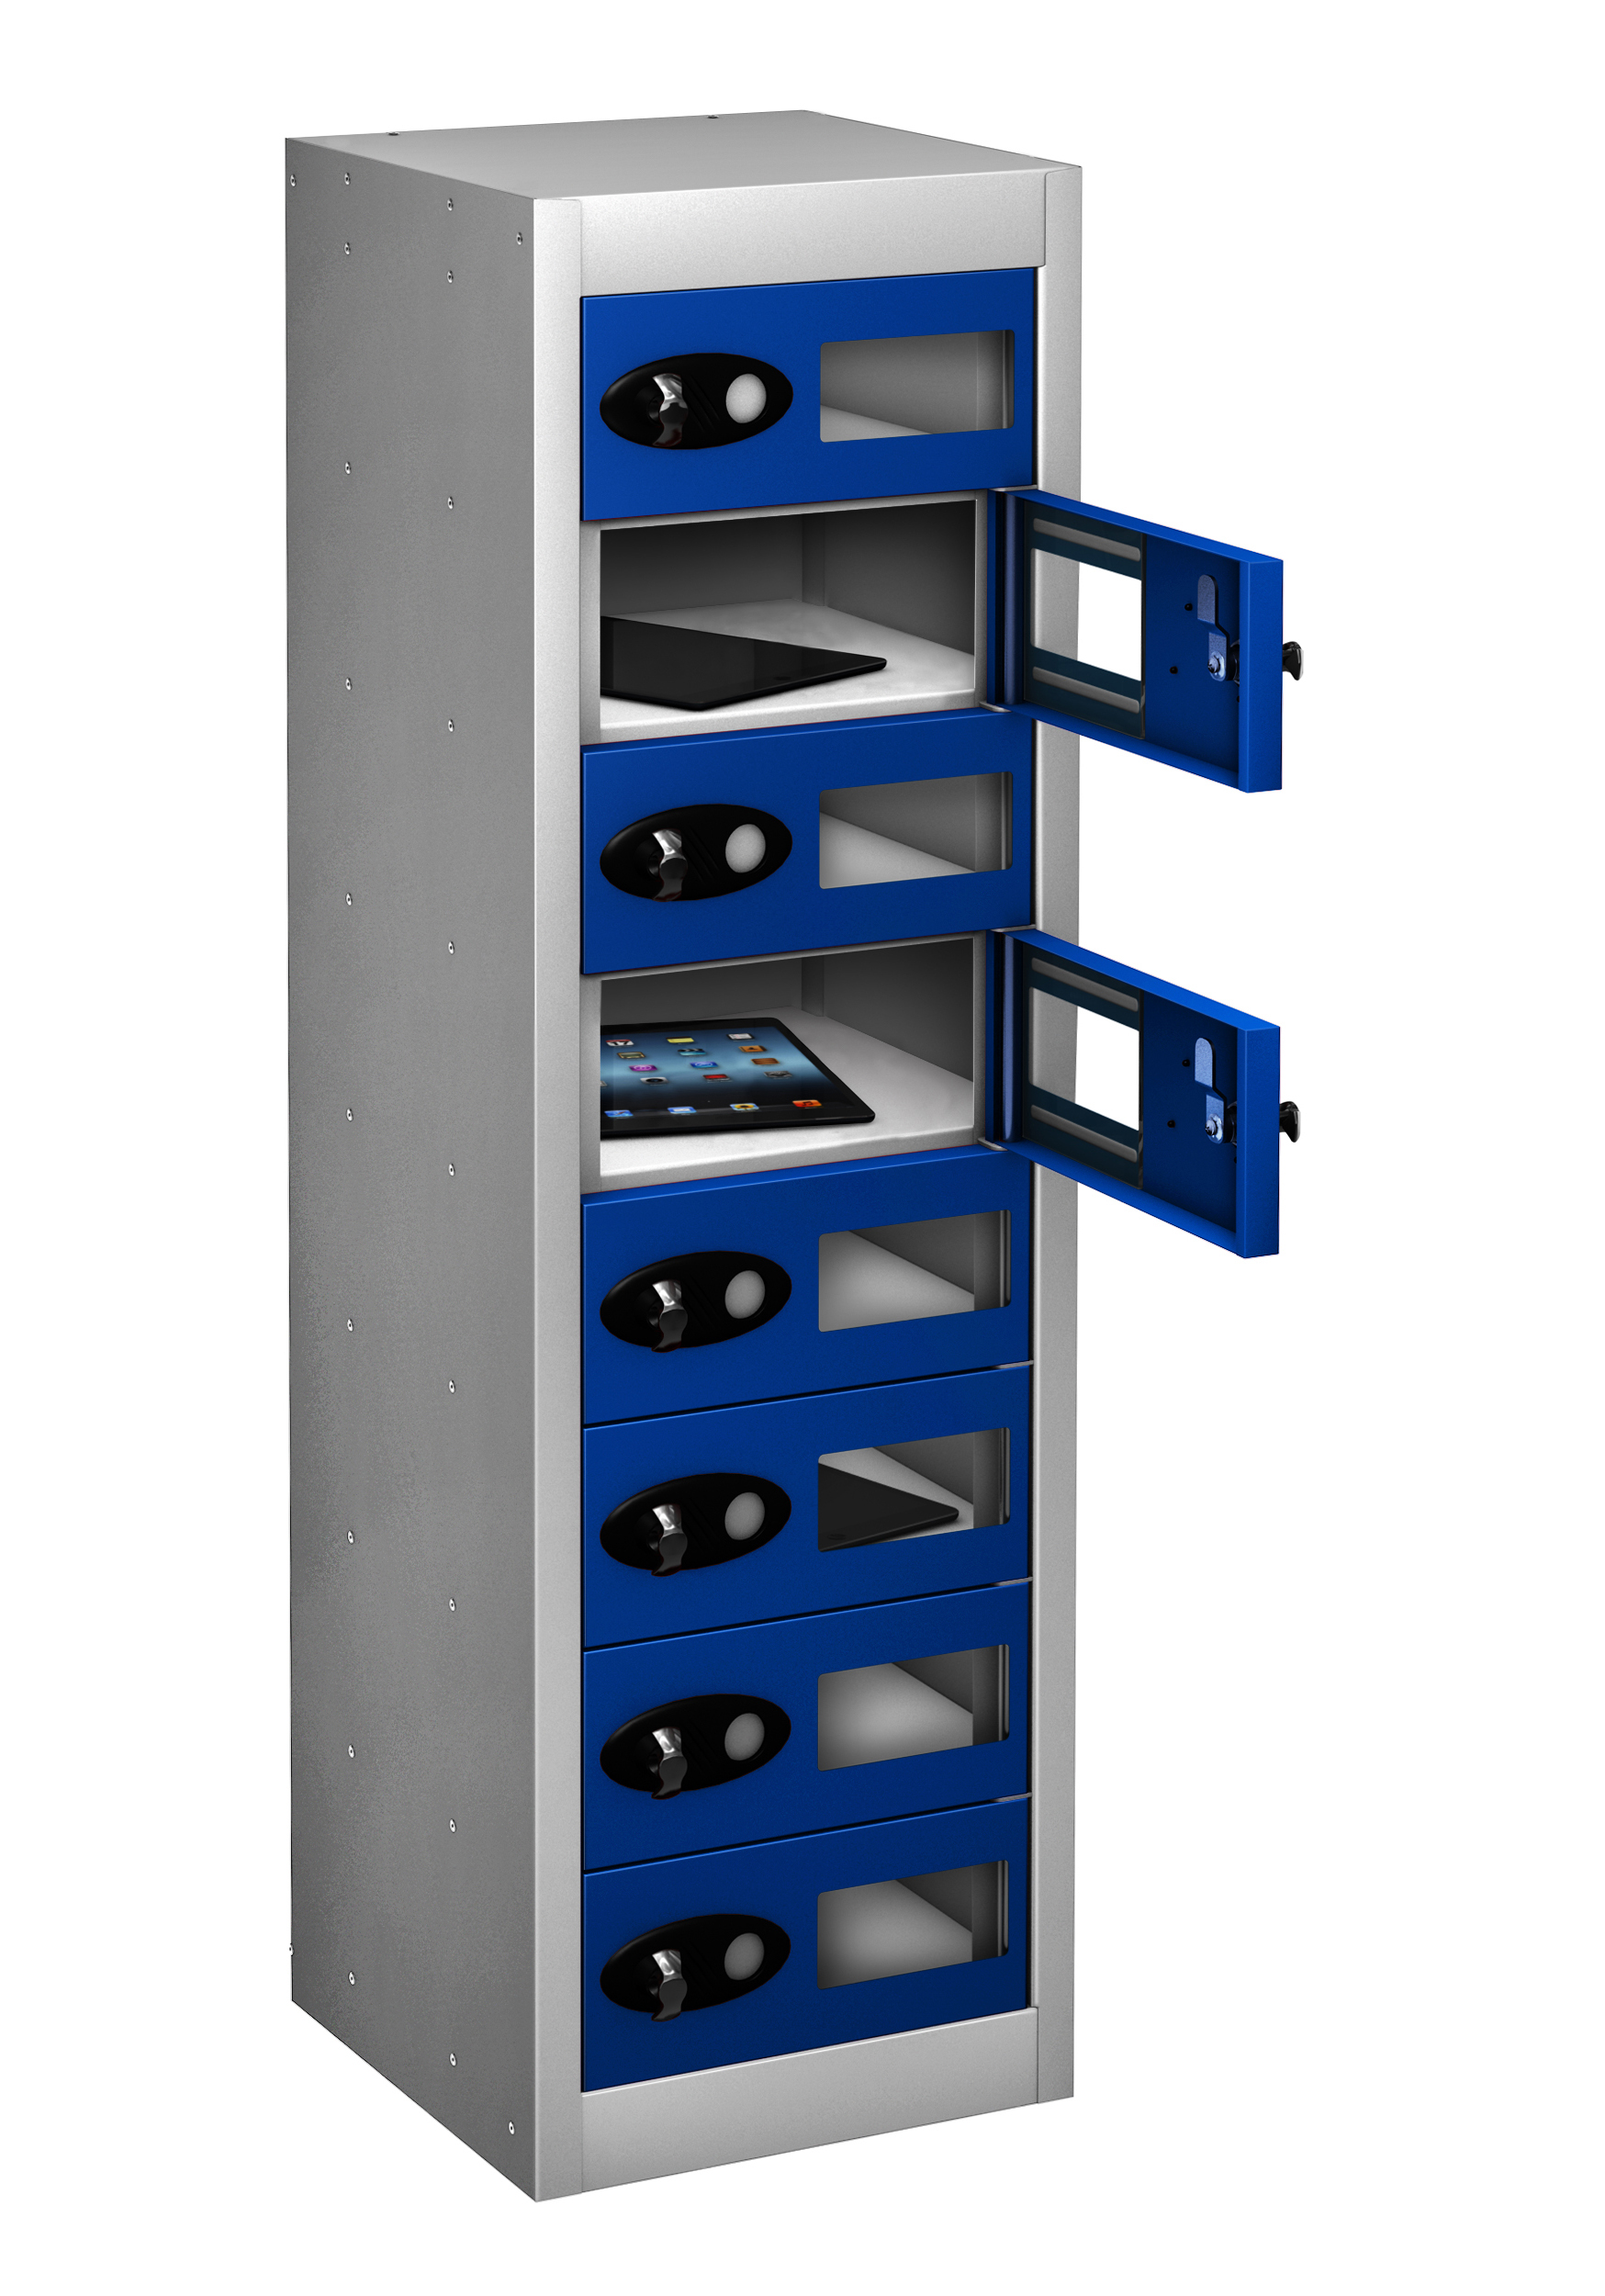 Low Vision Panel TABLET Storage Locker - 8 Doors (Non Charging)